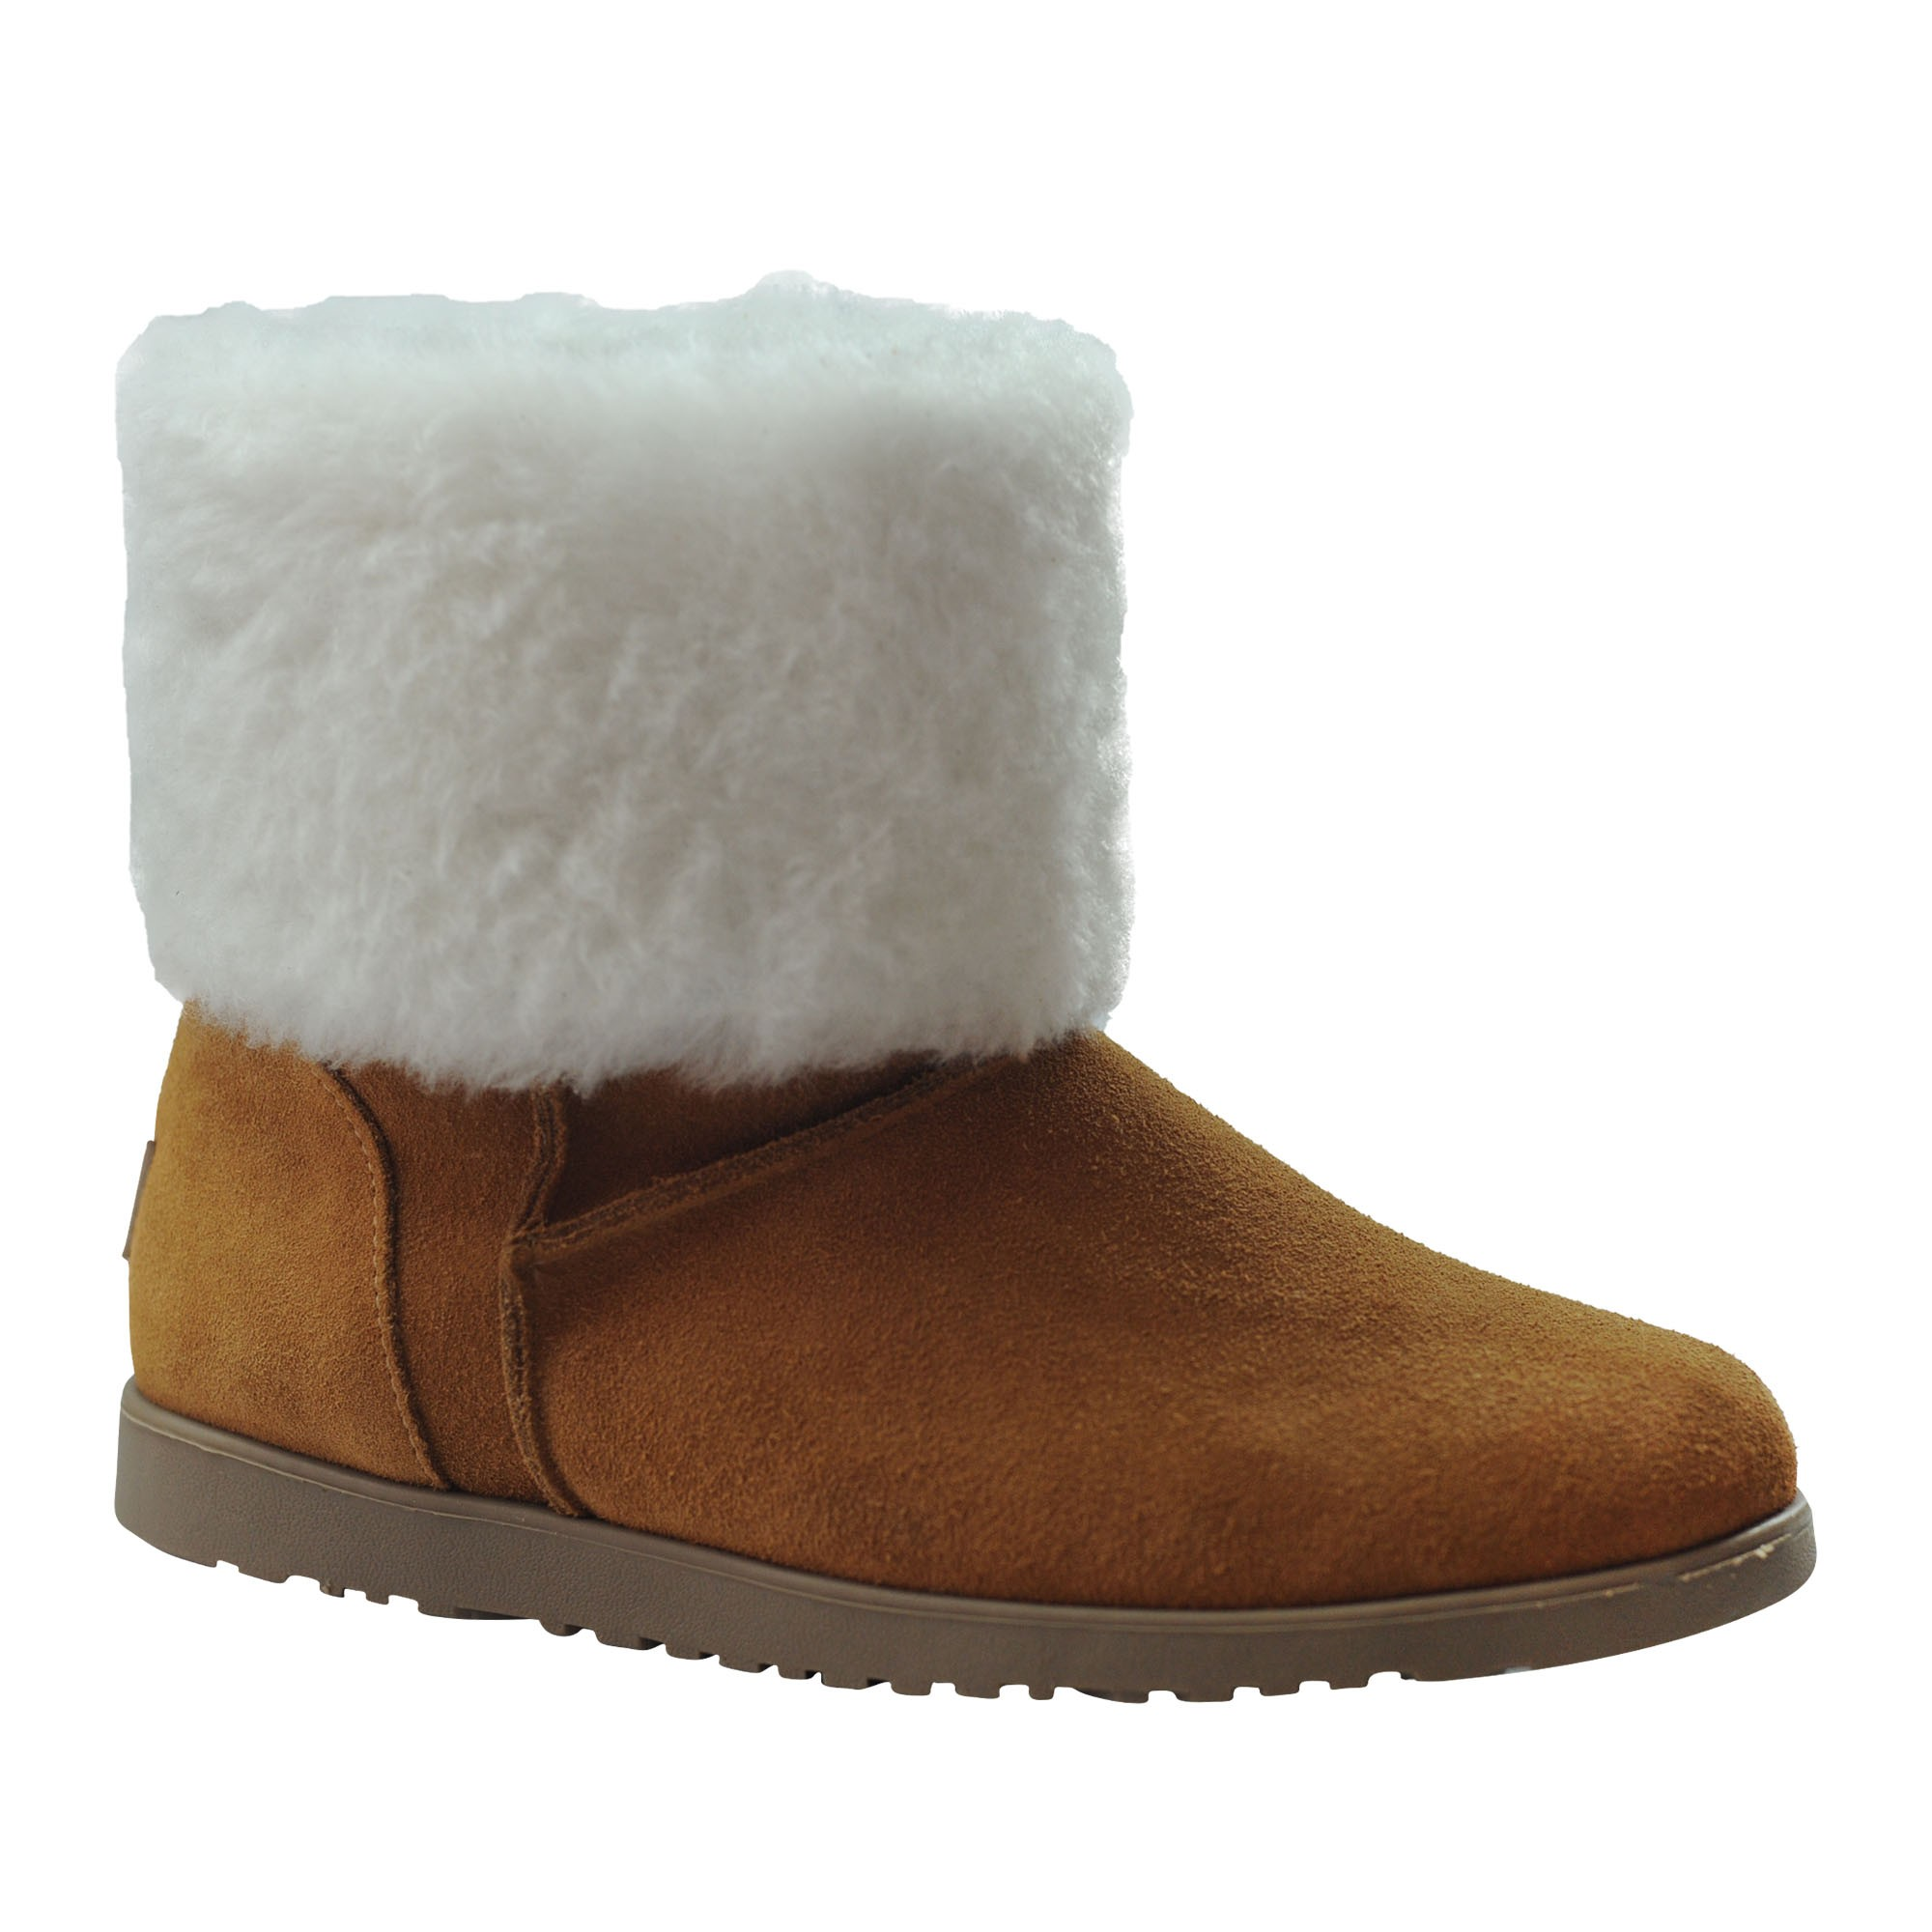 Bota Forrada para Neve Feminina Australian em lã de Carneiro. (Mod. Australian)